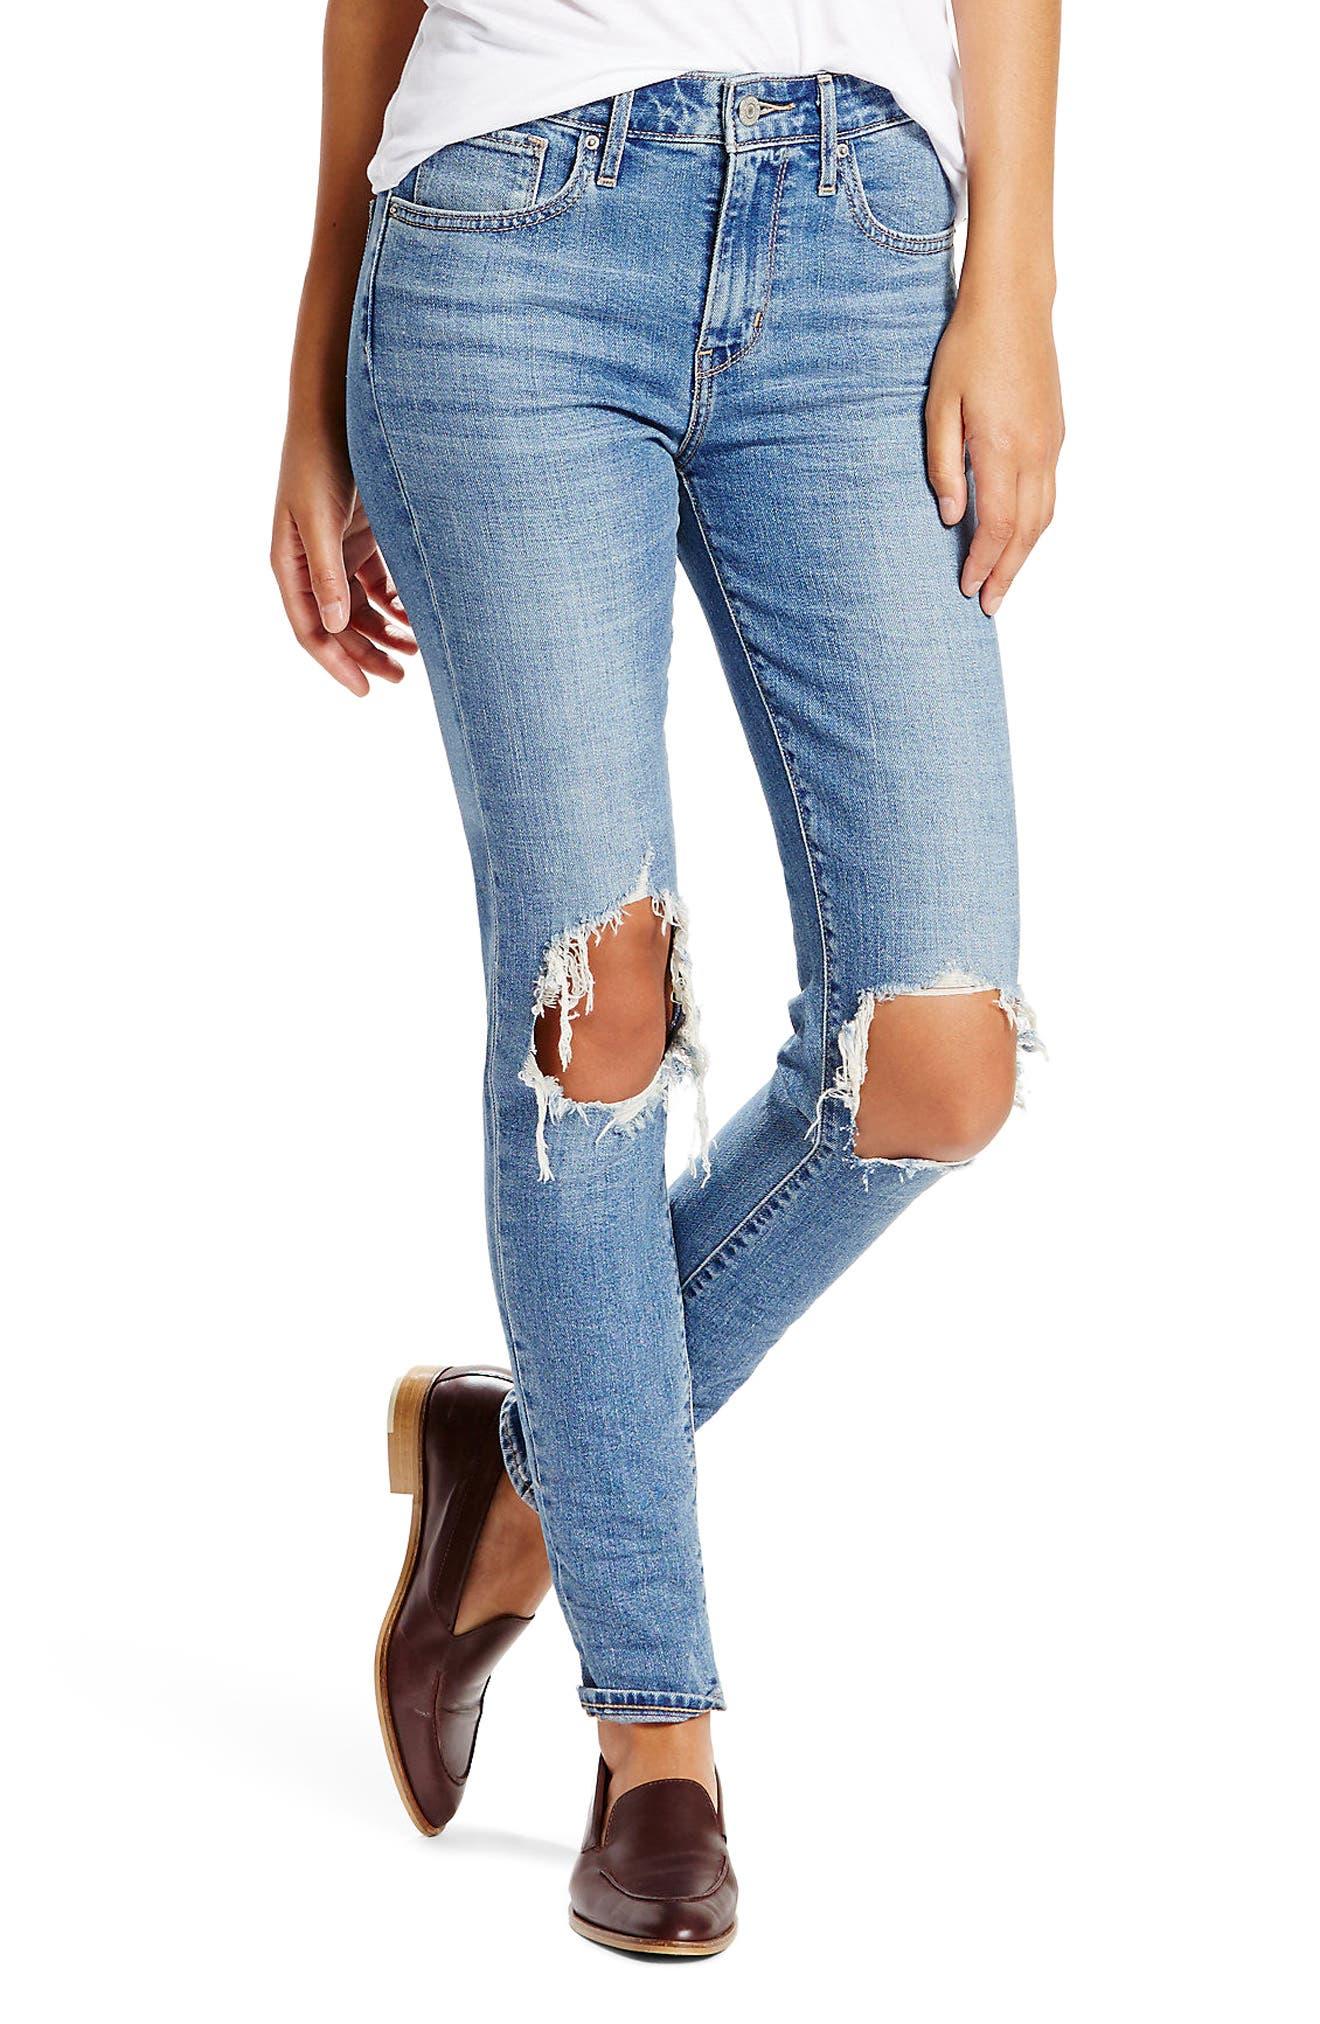 Alternate Image 1 Selected - Levi's® 721 Ripped High Waist Skinny Jeans (Rugged Indigo)